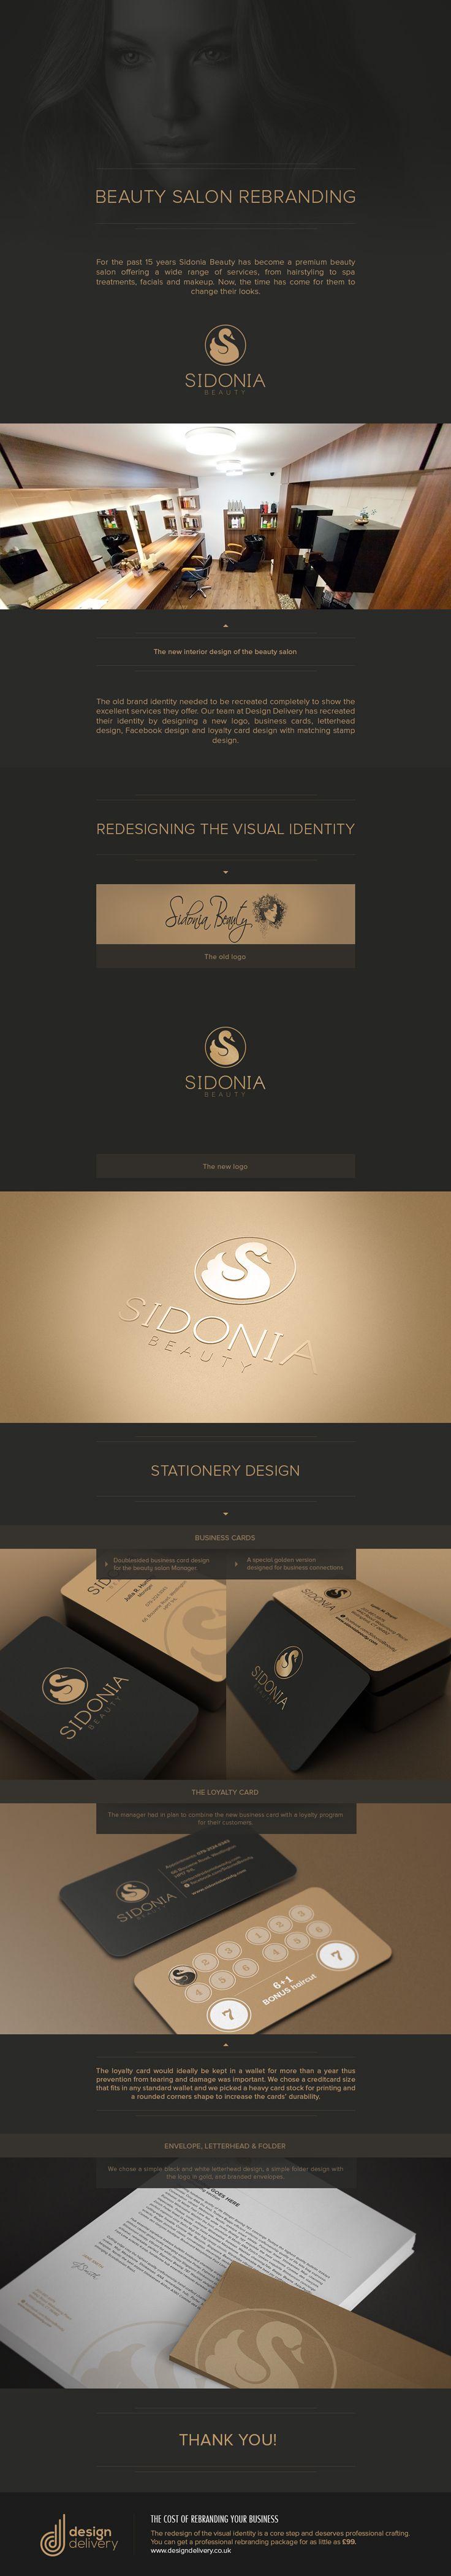 Case study: logo redesign for beauty salon #logo #swan